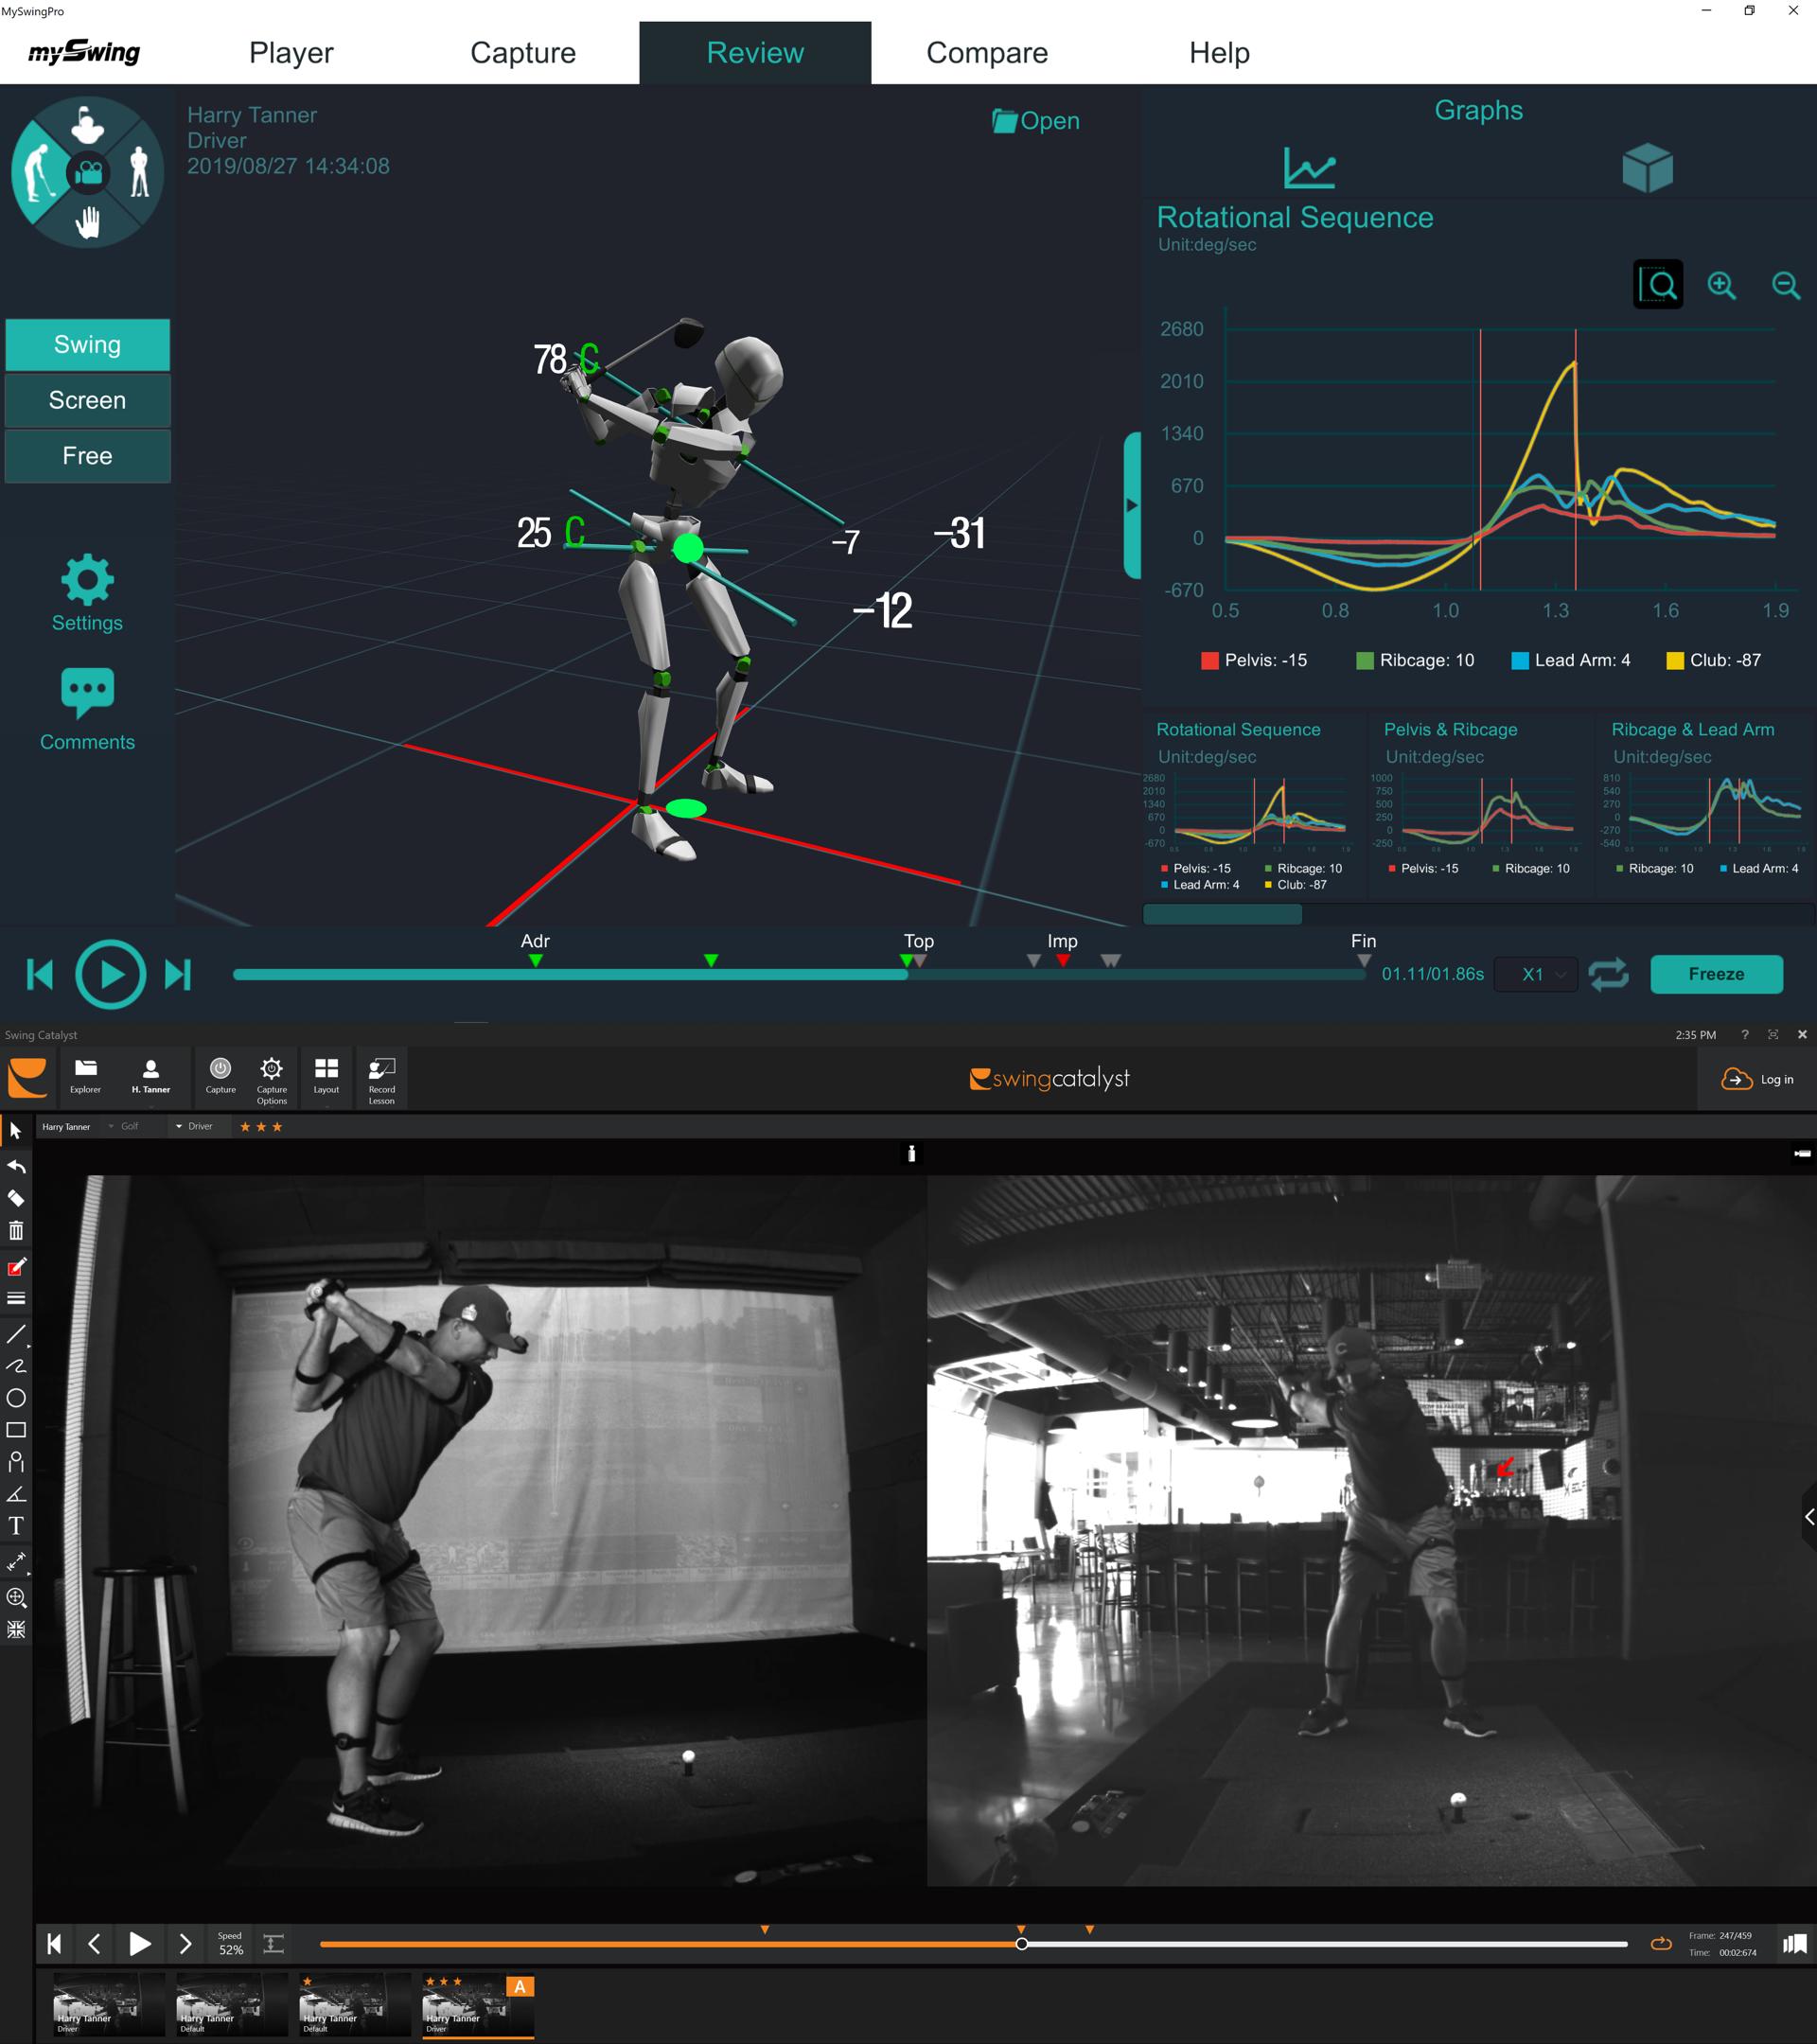 Image showcasing X-Golf swing analysis